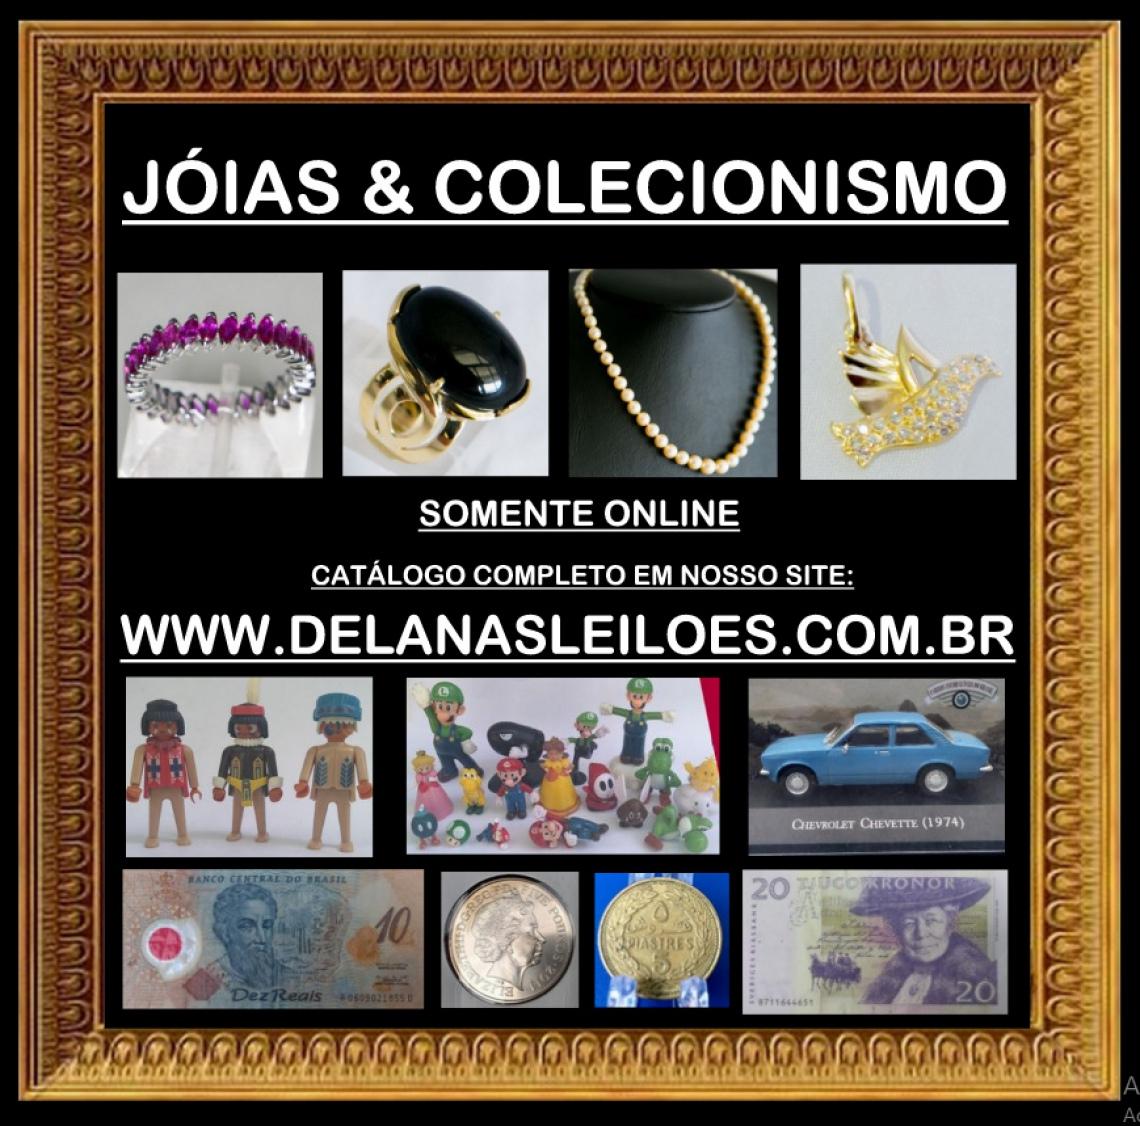 JOIAS & COLECIONISMO